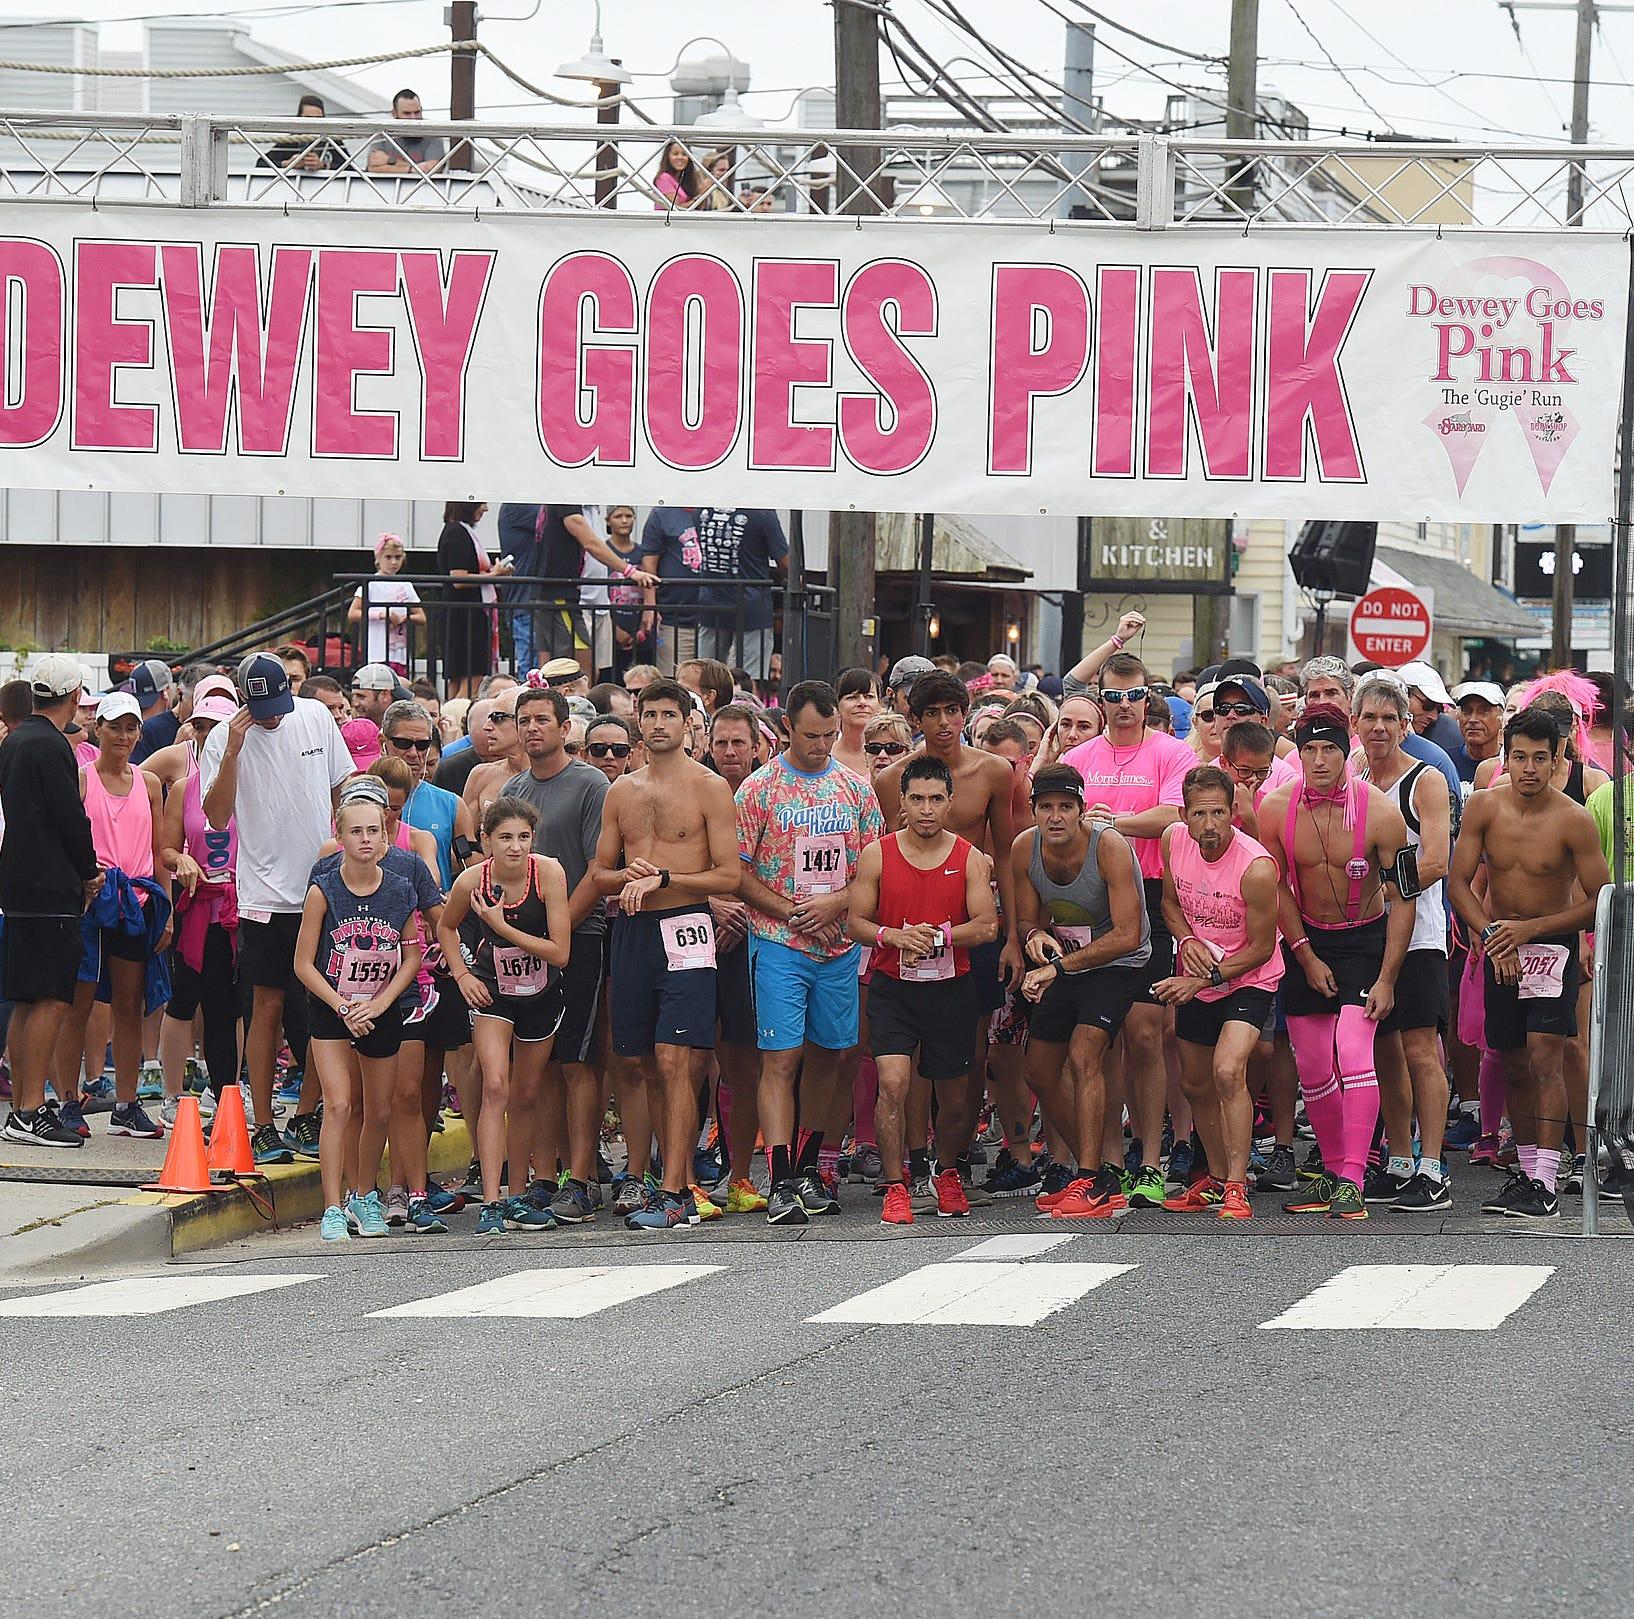 Dewey Goes Pink 5K smashes fundraising record